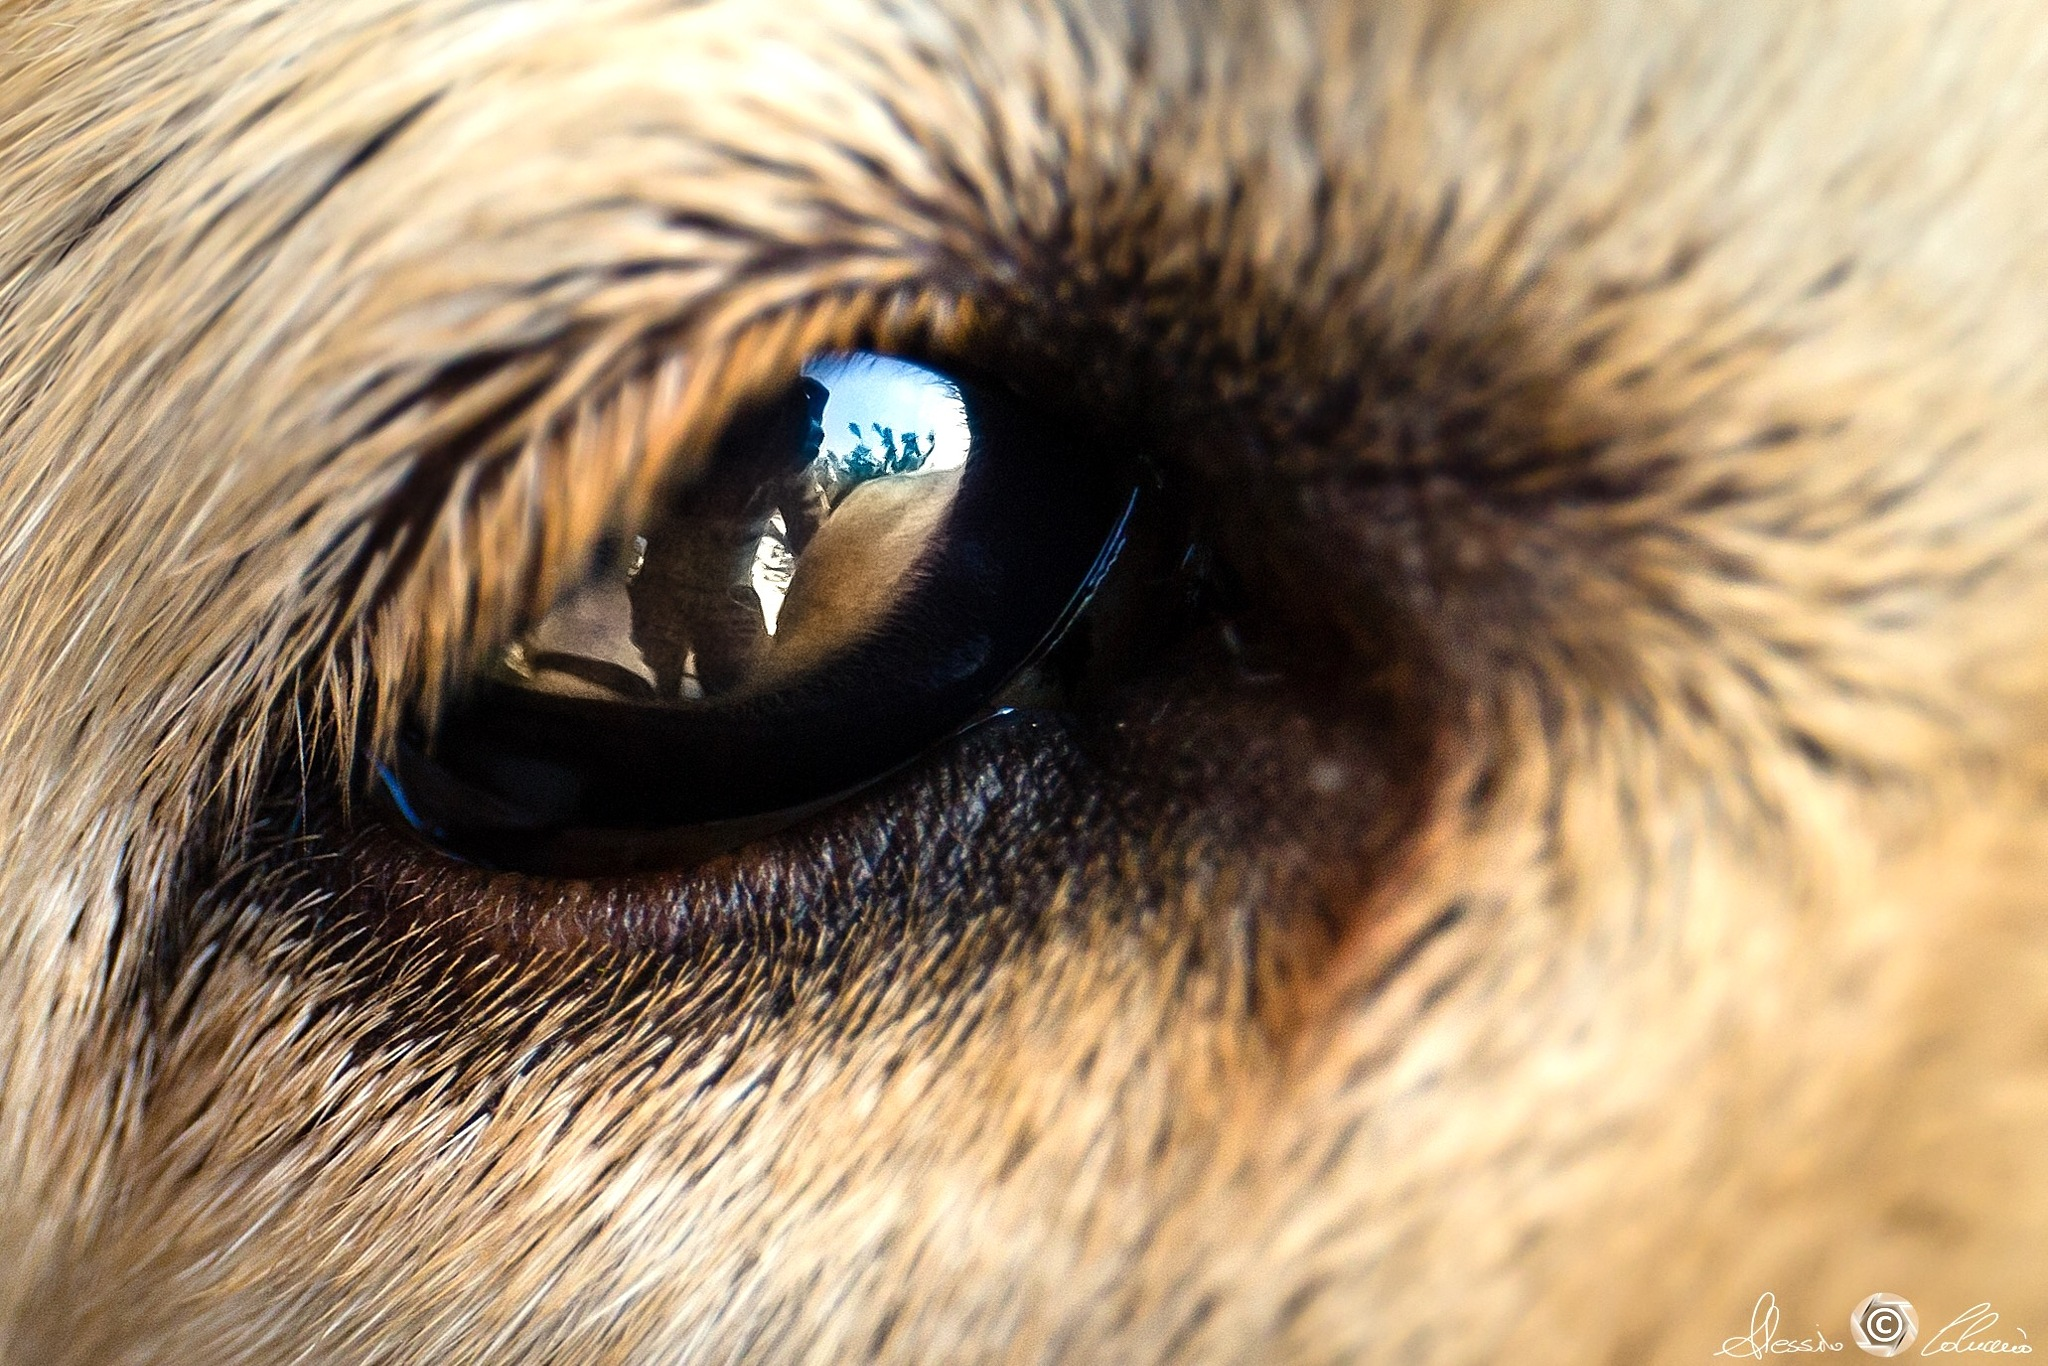 Mirror-eye by Alessio Coluccio